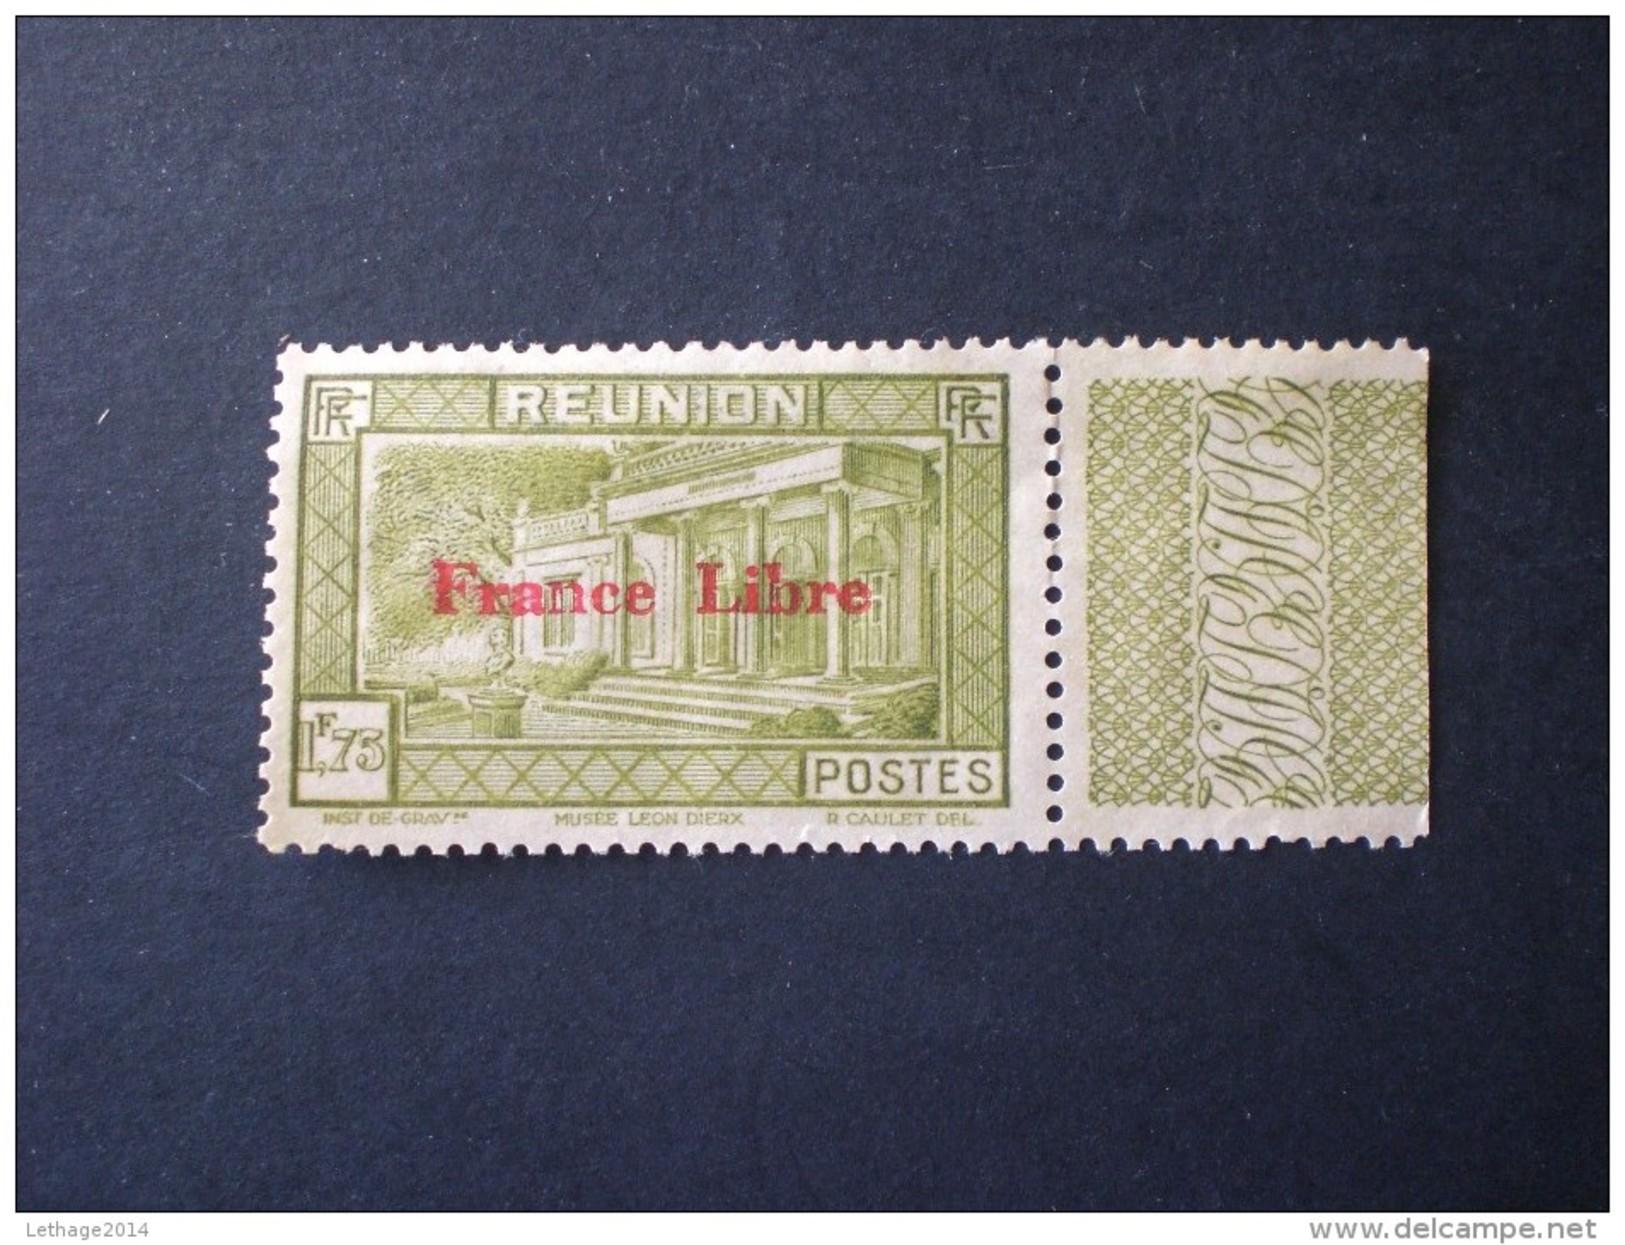 STAMPS REUNION ISLAND 1943 TIMBRES 1933-39 SURCHANGES FRANCE LIBRE MNG - Réunion (1852-1975)